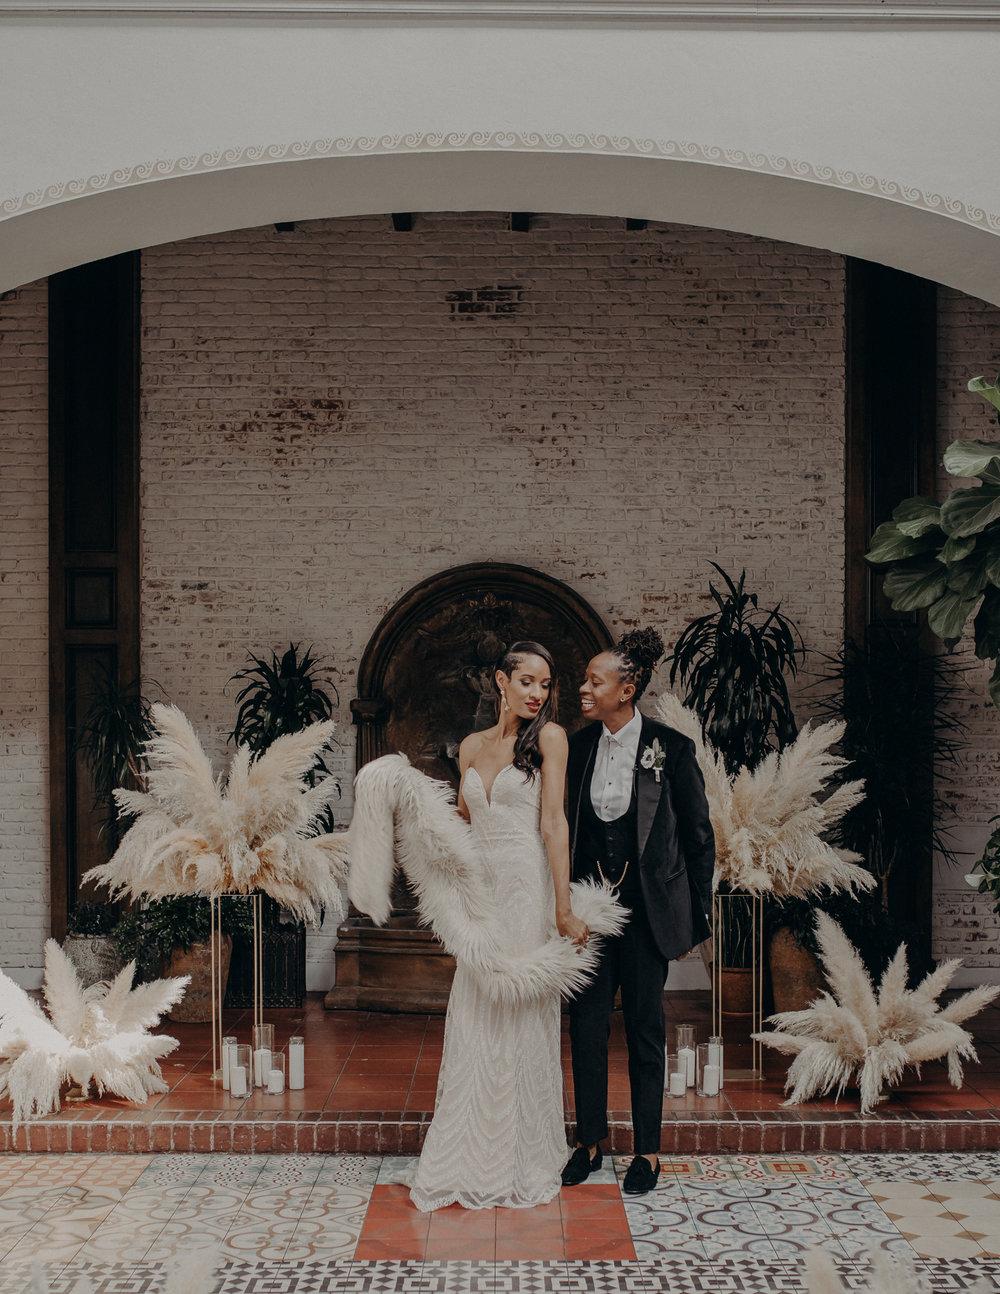 Wedding Photographer in Los Angeles - Ebell of Long Beach Wedding - LGBTQ weddings - lesbian wedding - IsaiahAndTaylor.com-062.jpg